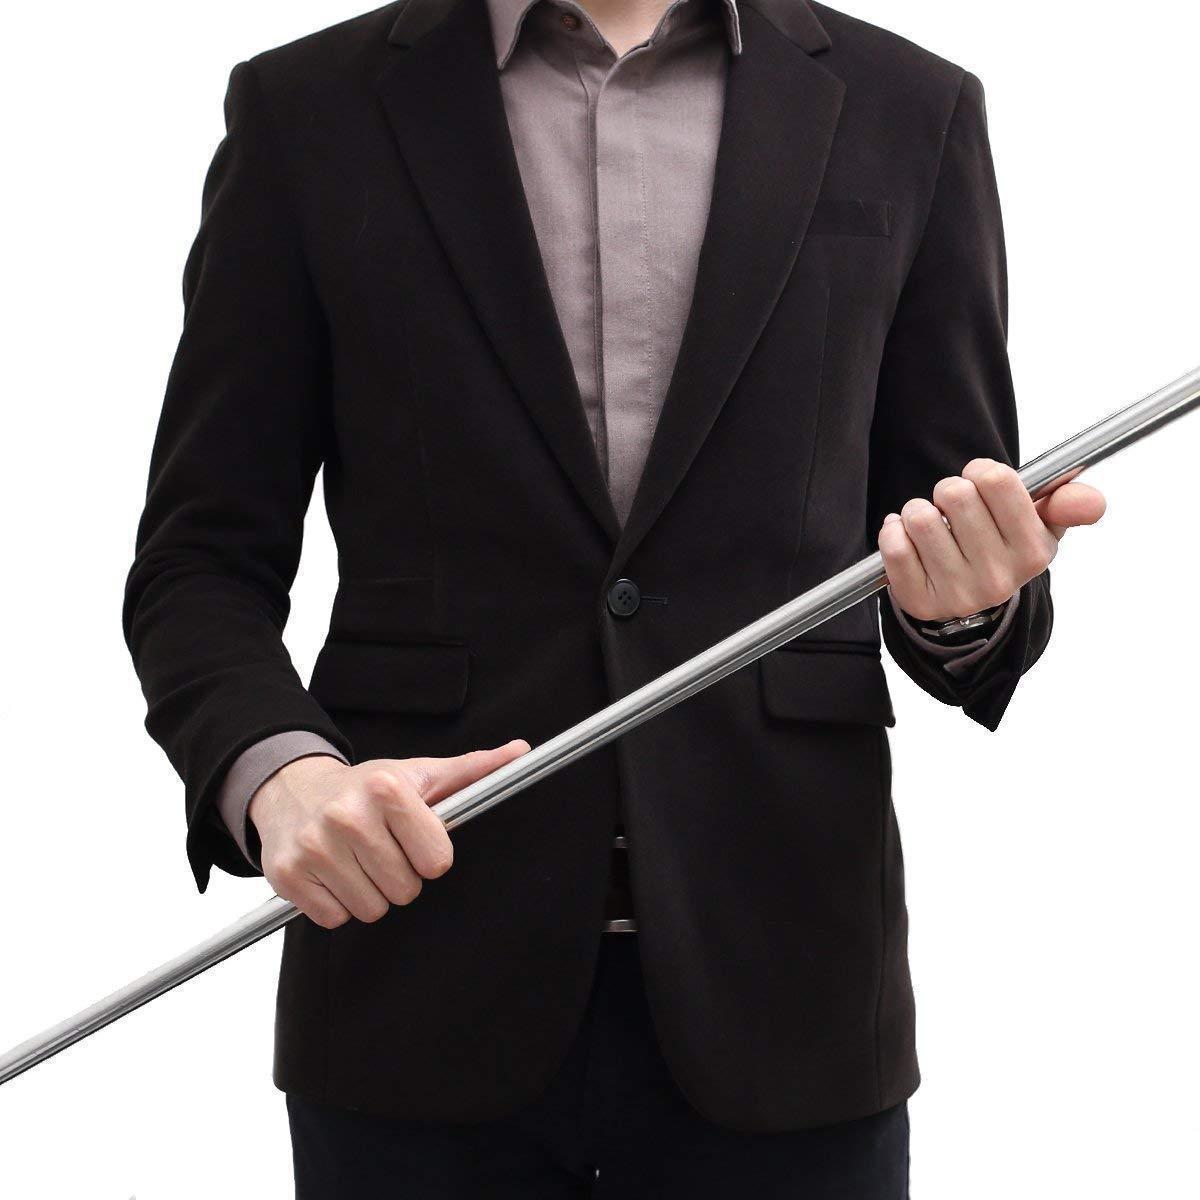 Pocket staff - Expandable/Extendable Martial Arts Magic Metal Staff